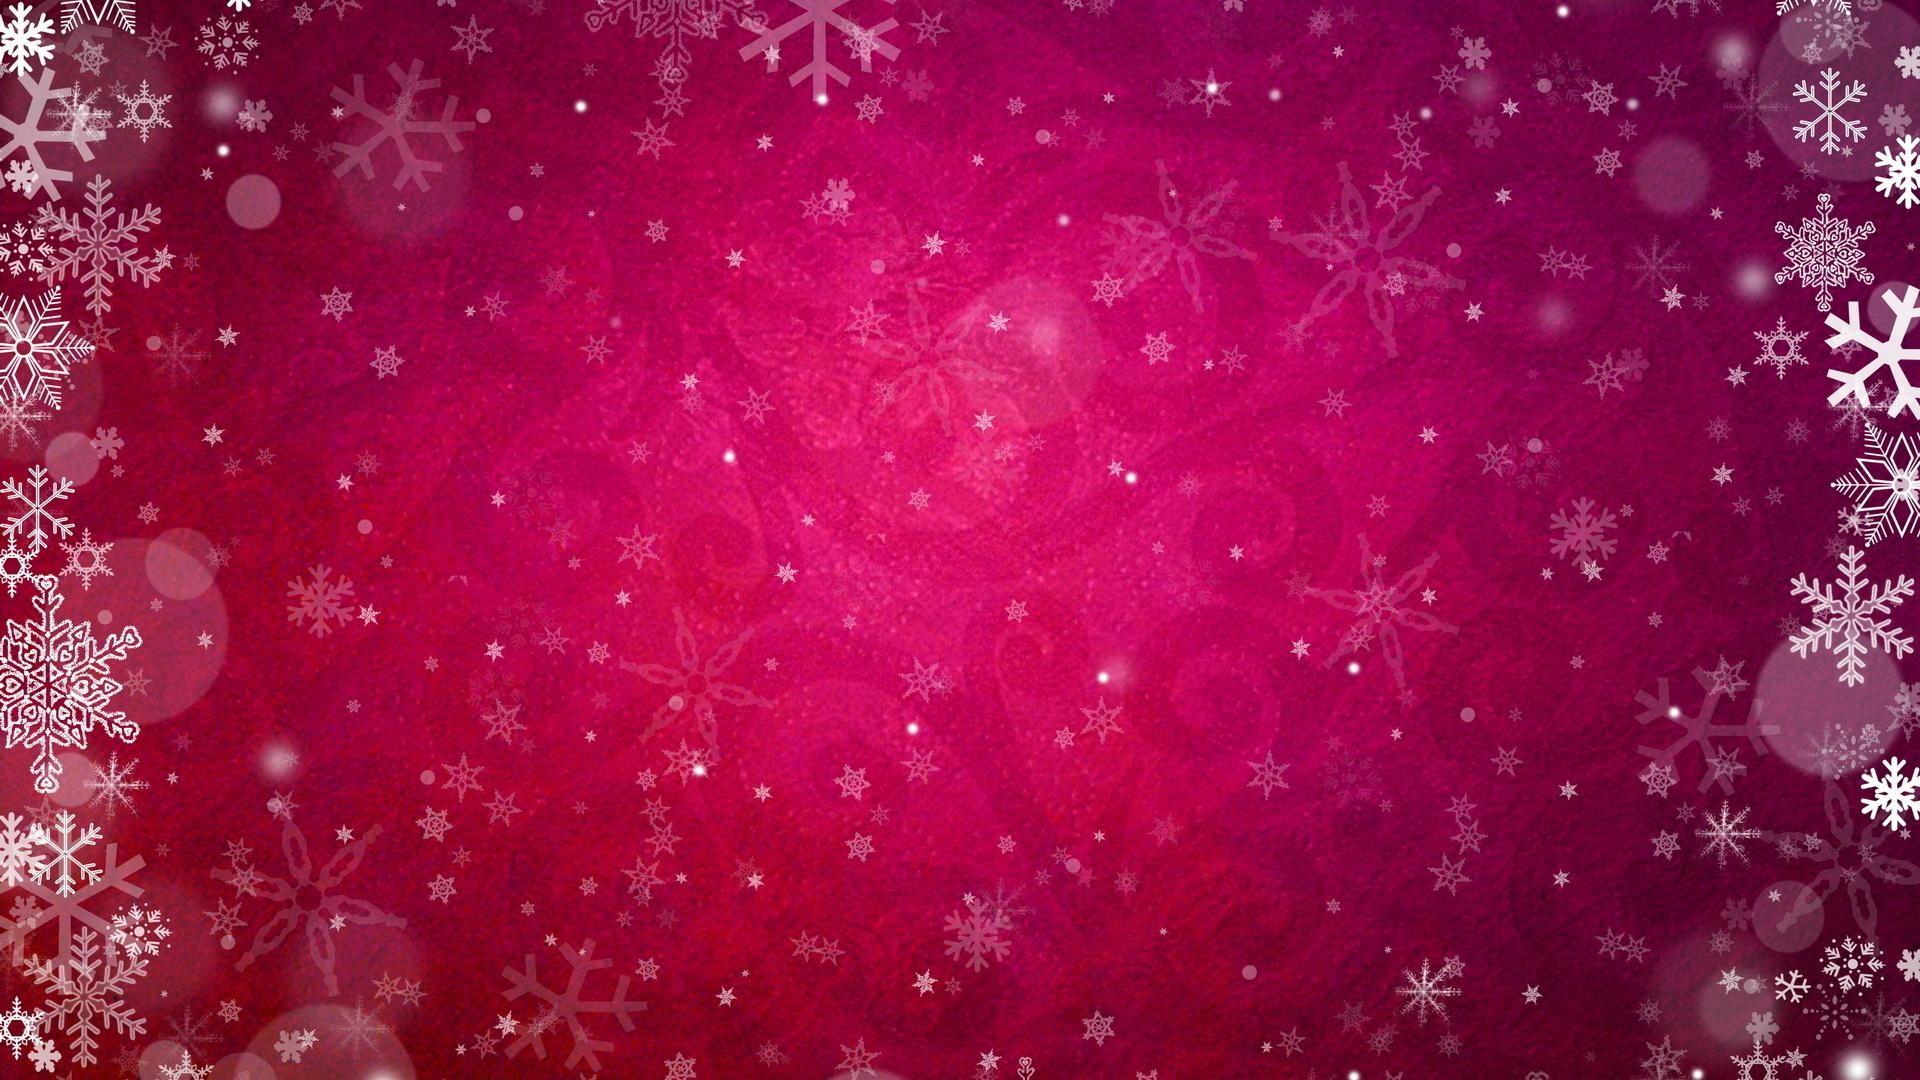 Res: 1920x1080, Download Glitter Desktop Wallpaper 39 Free Desktop Backgrounds